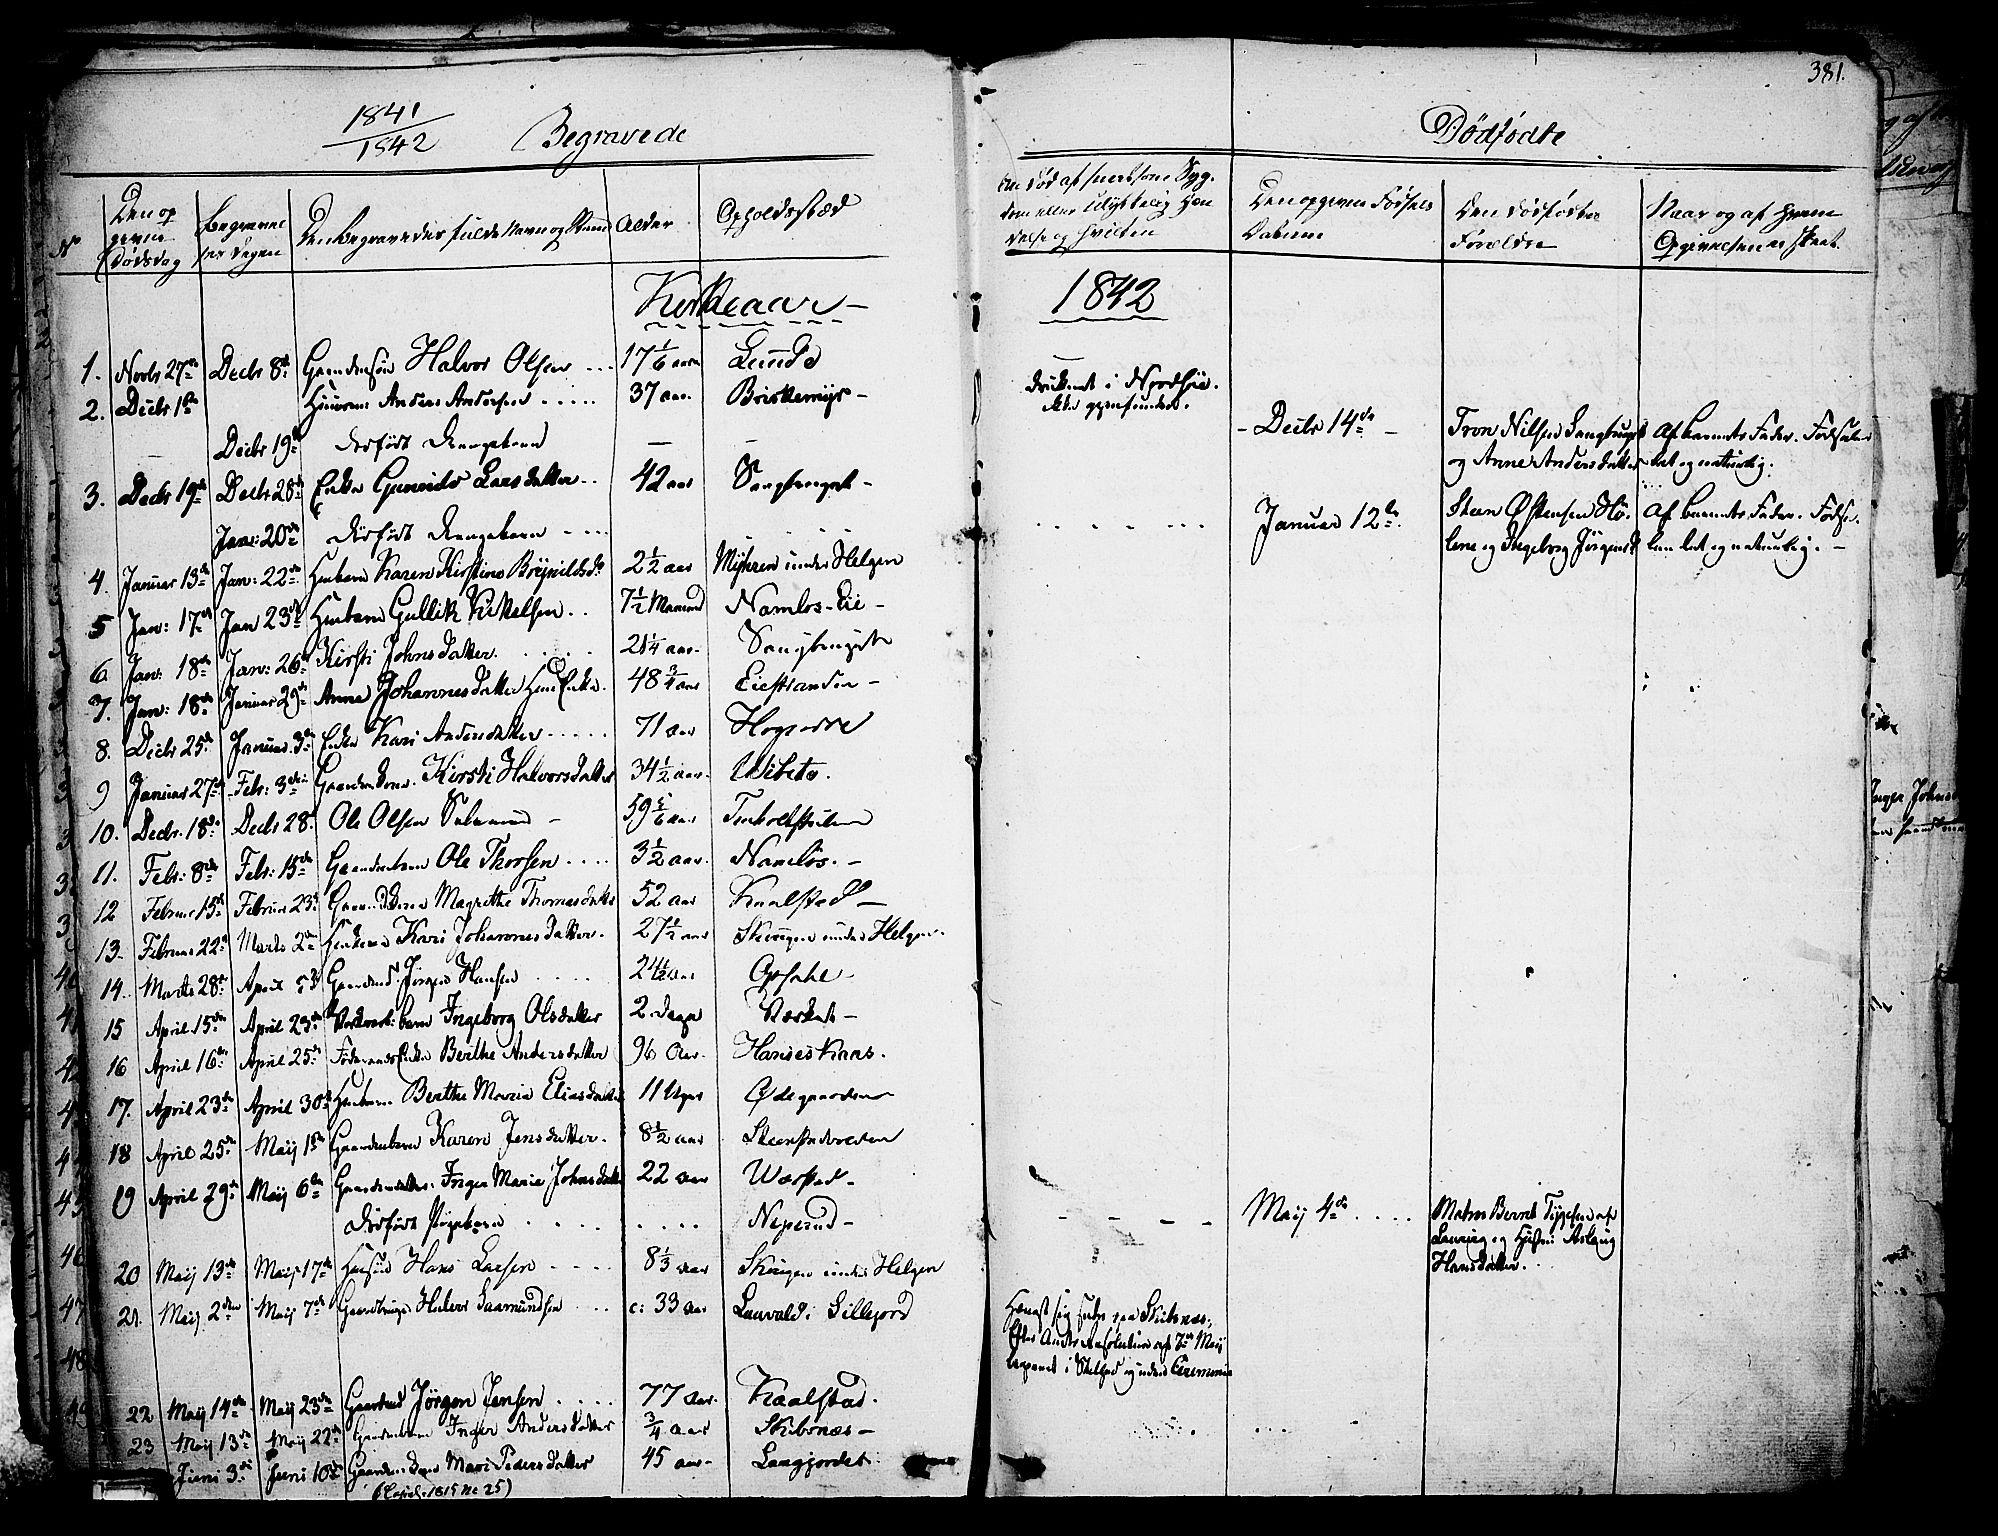 SAKO, Holla kirkebøker, F/Fa/L0004: Ministerialbok nr. 4, 1830-1848, s. 381